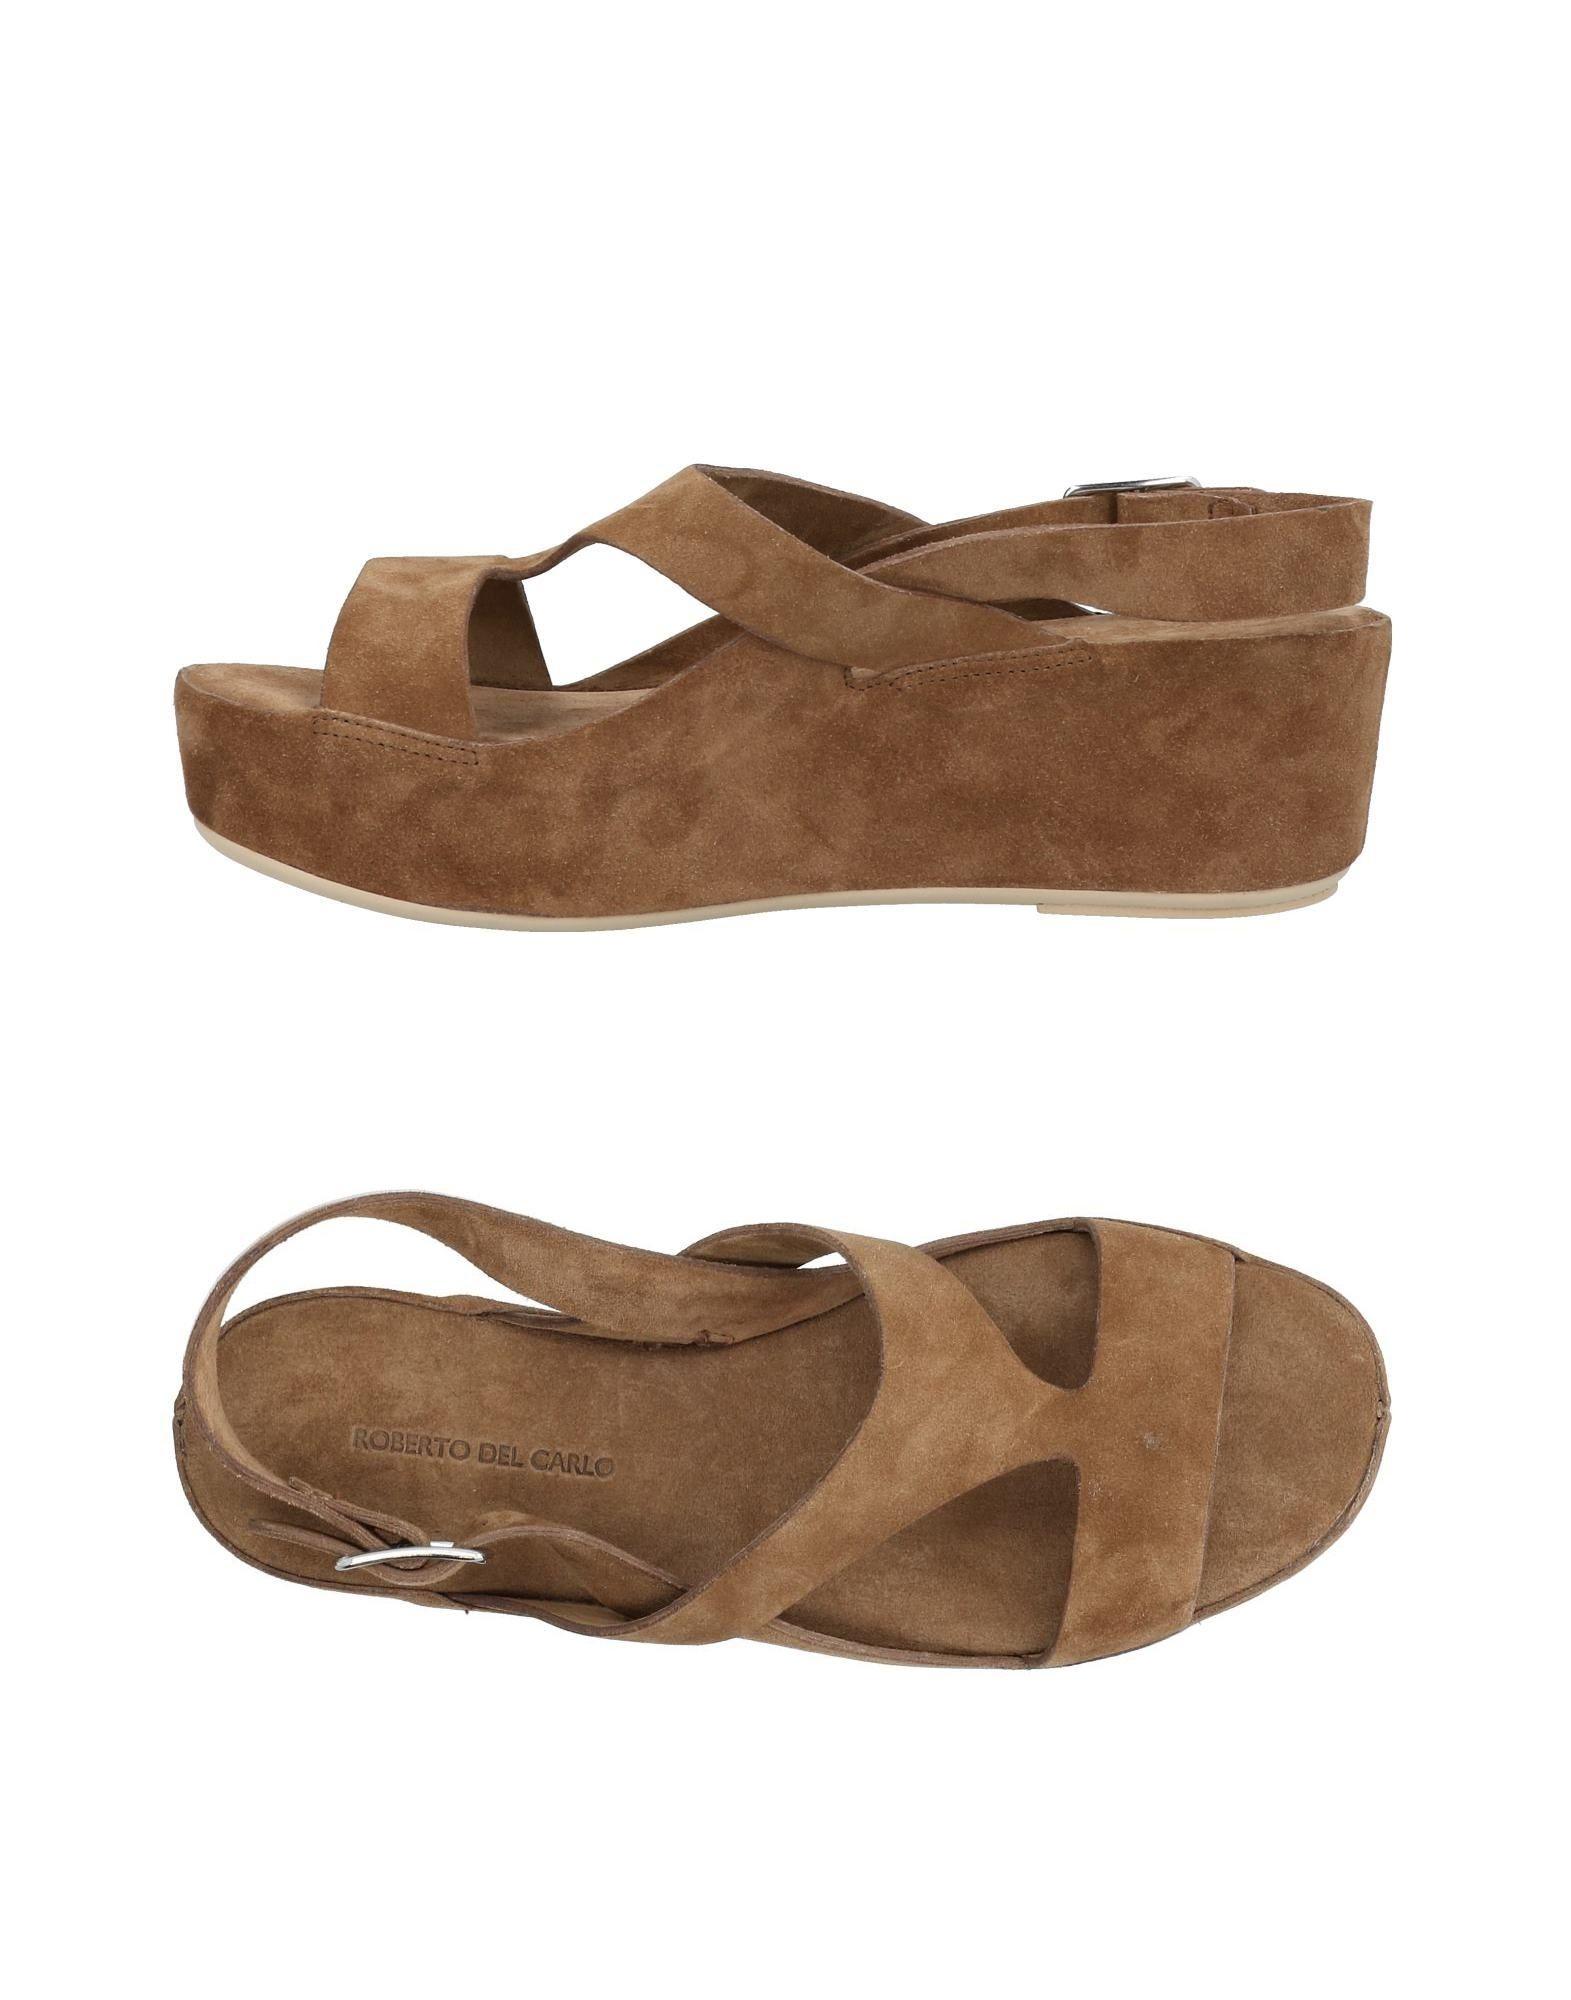 Stilvolle billige Schuhe Roberto Del Carlo Sandalen Damen  11425249GM